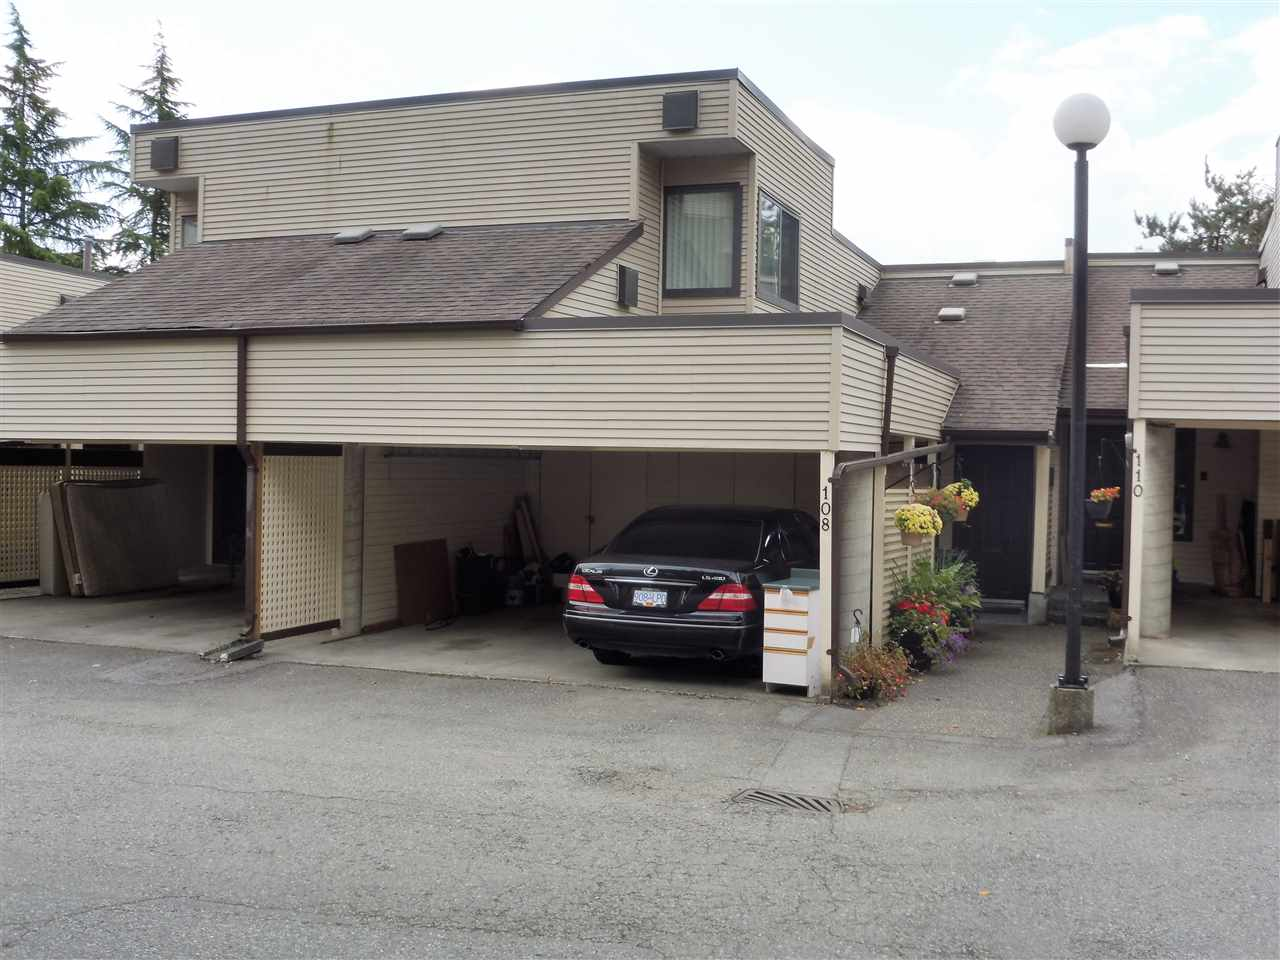 Buliding: 1210 Falcon Drive, Coquitlam, BC